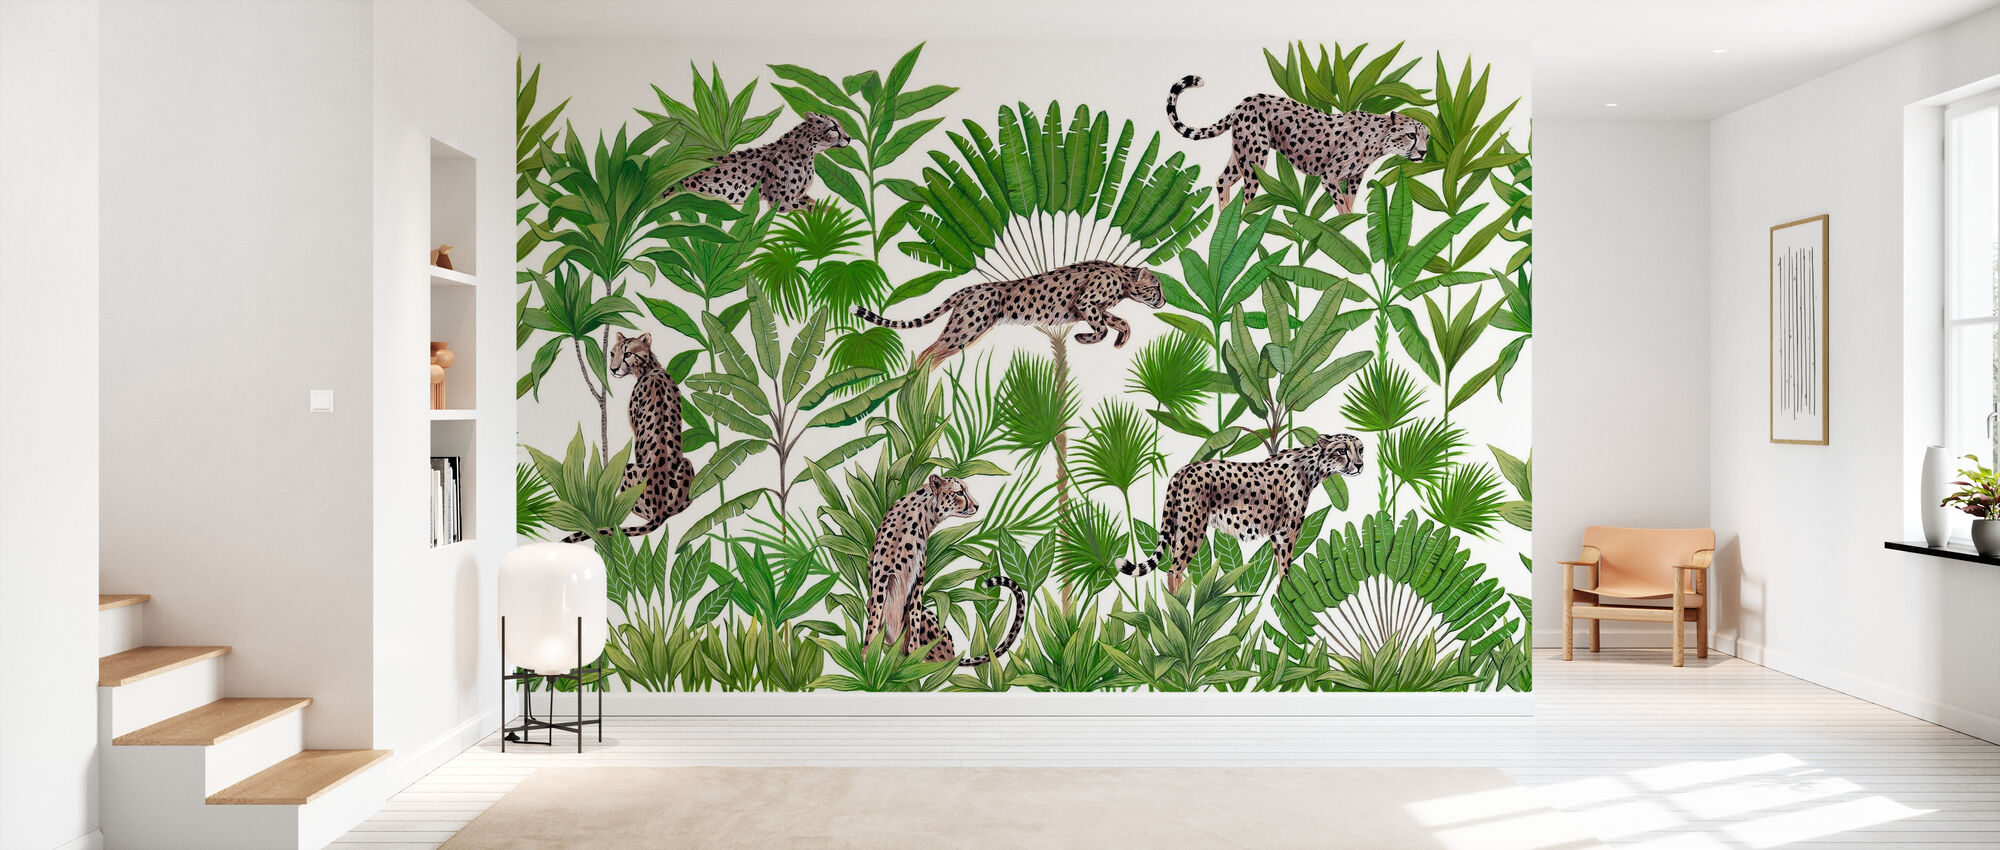 Lurking Cheetahs - Wallpaper - Hallway